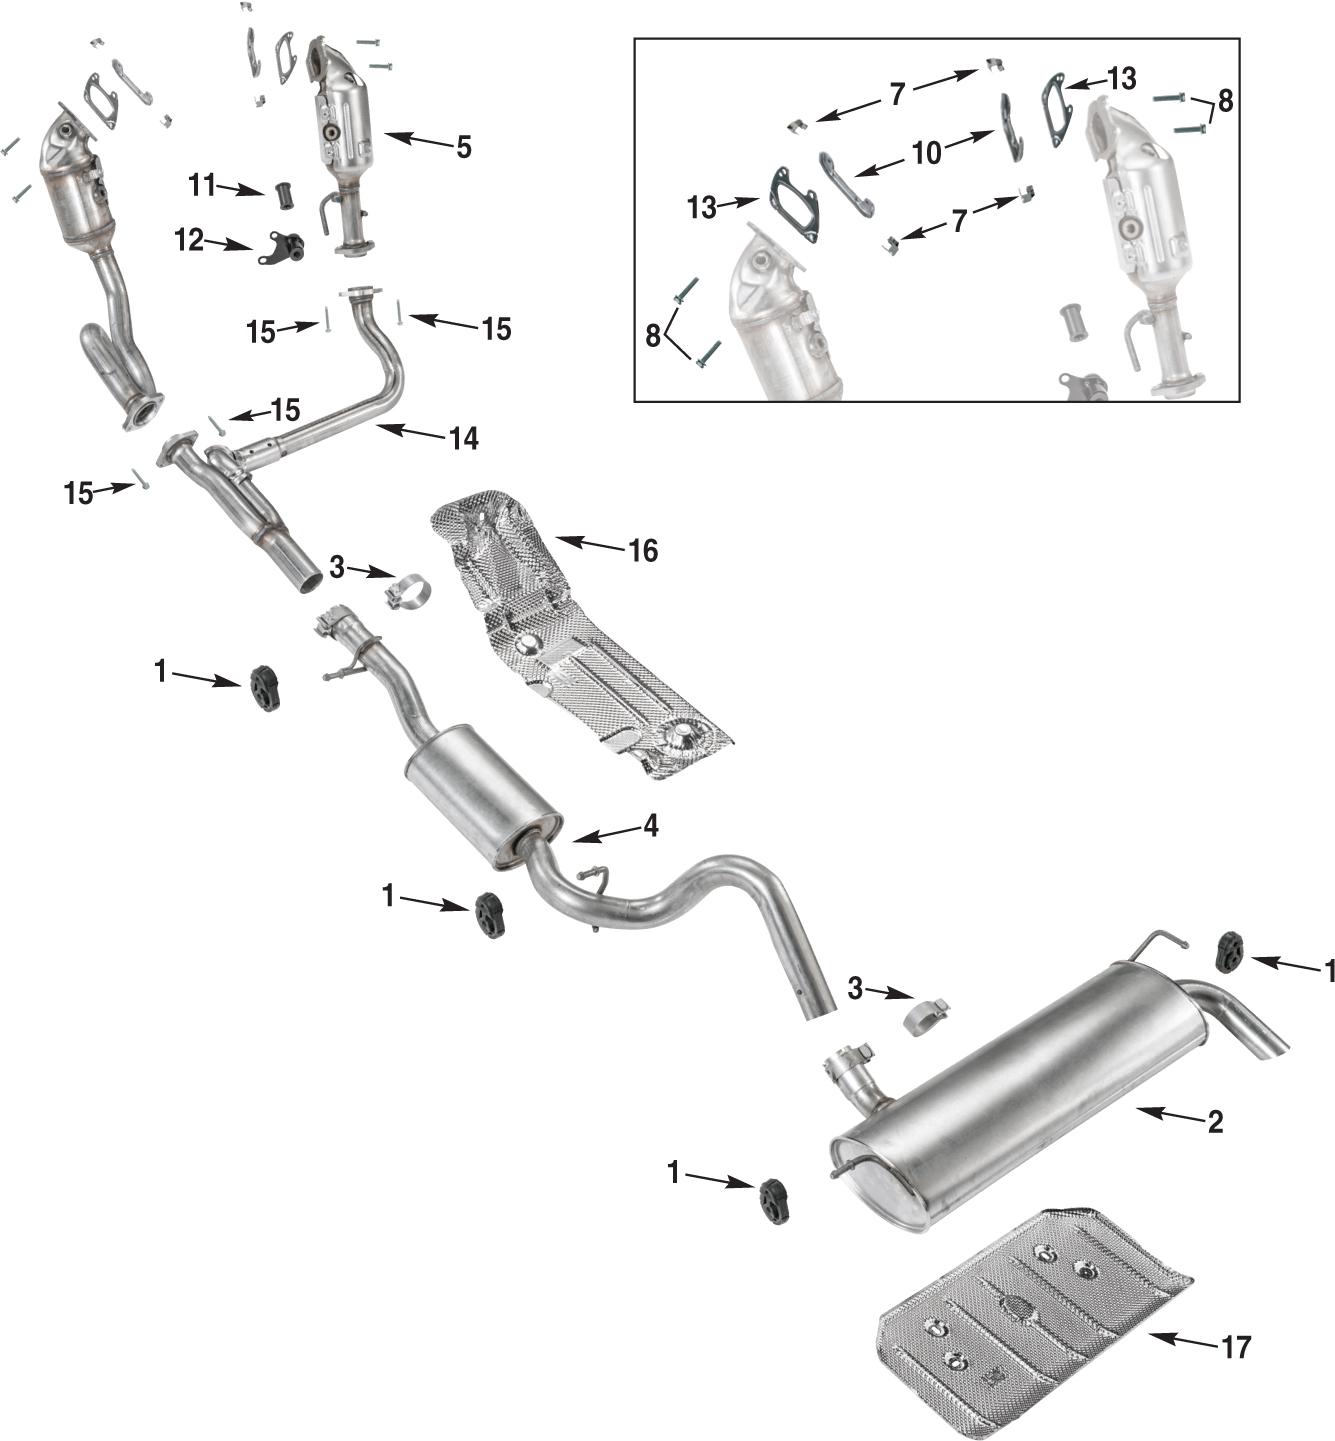 Jeep Wrangler Jl Exhaust Parts 18 19